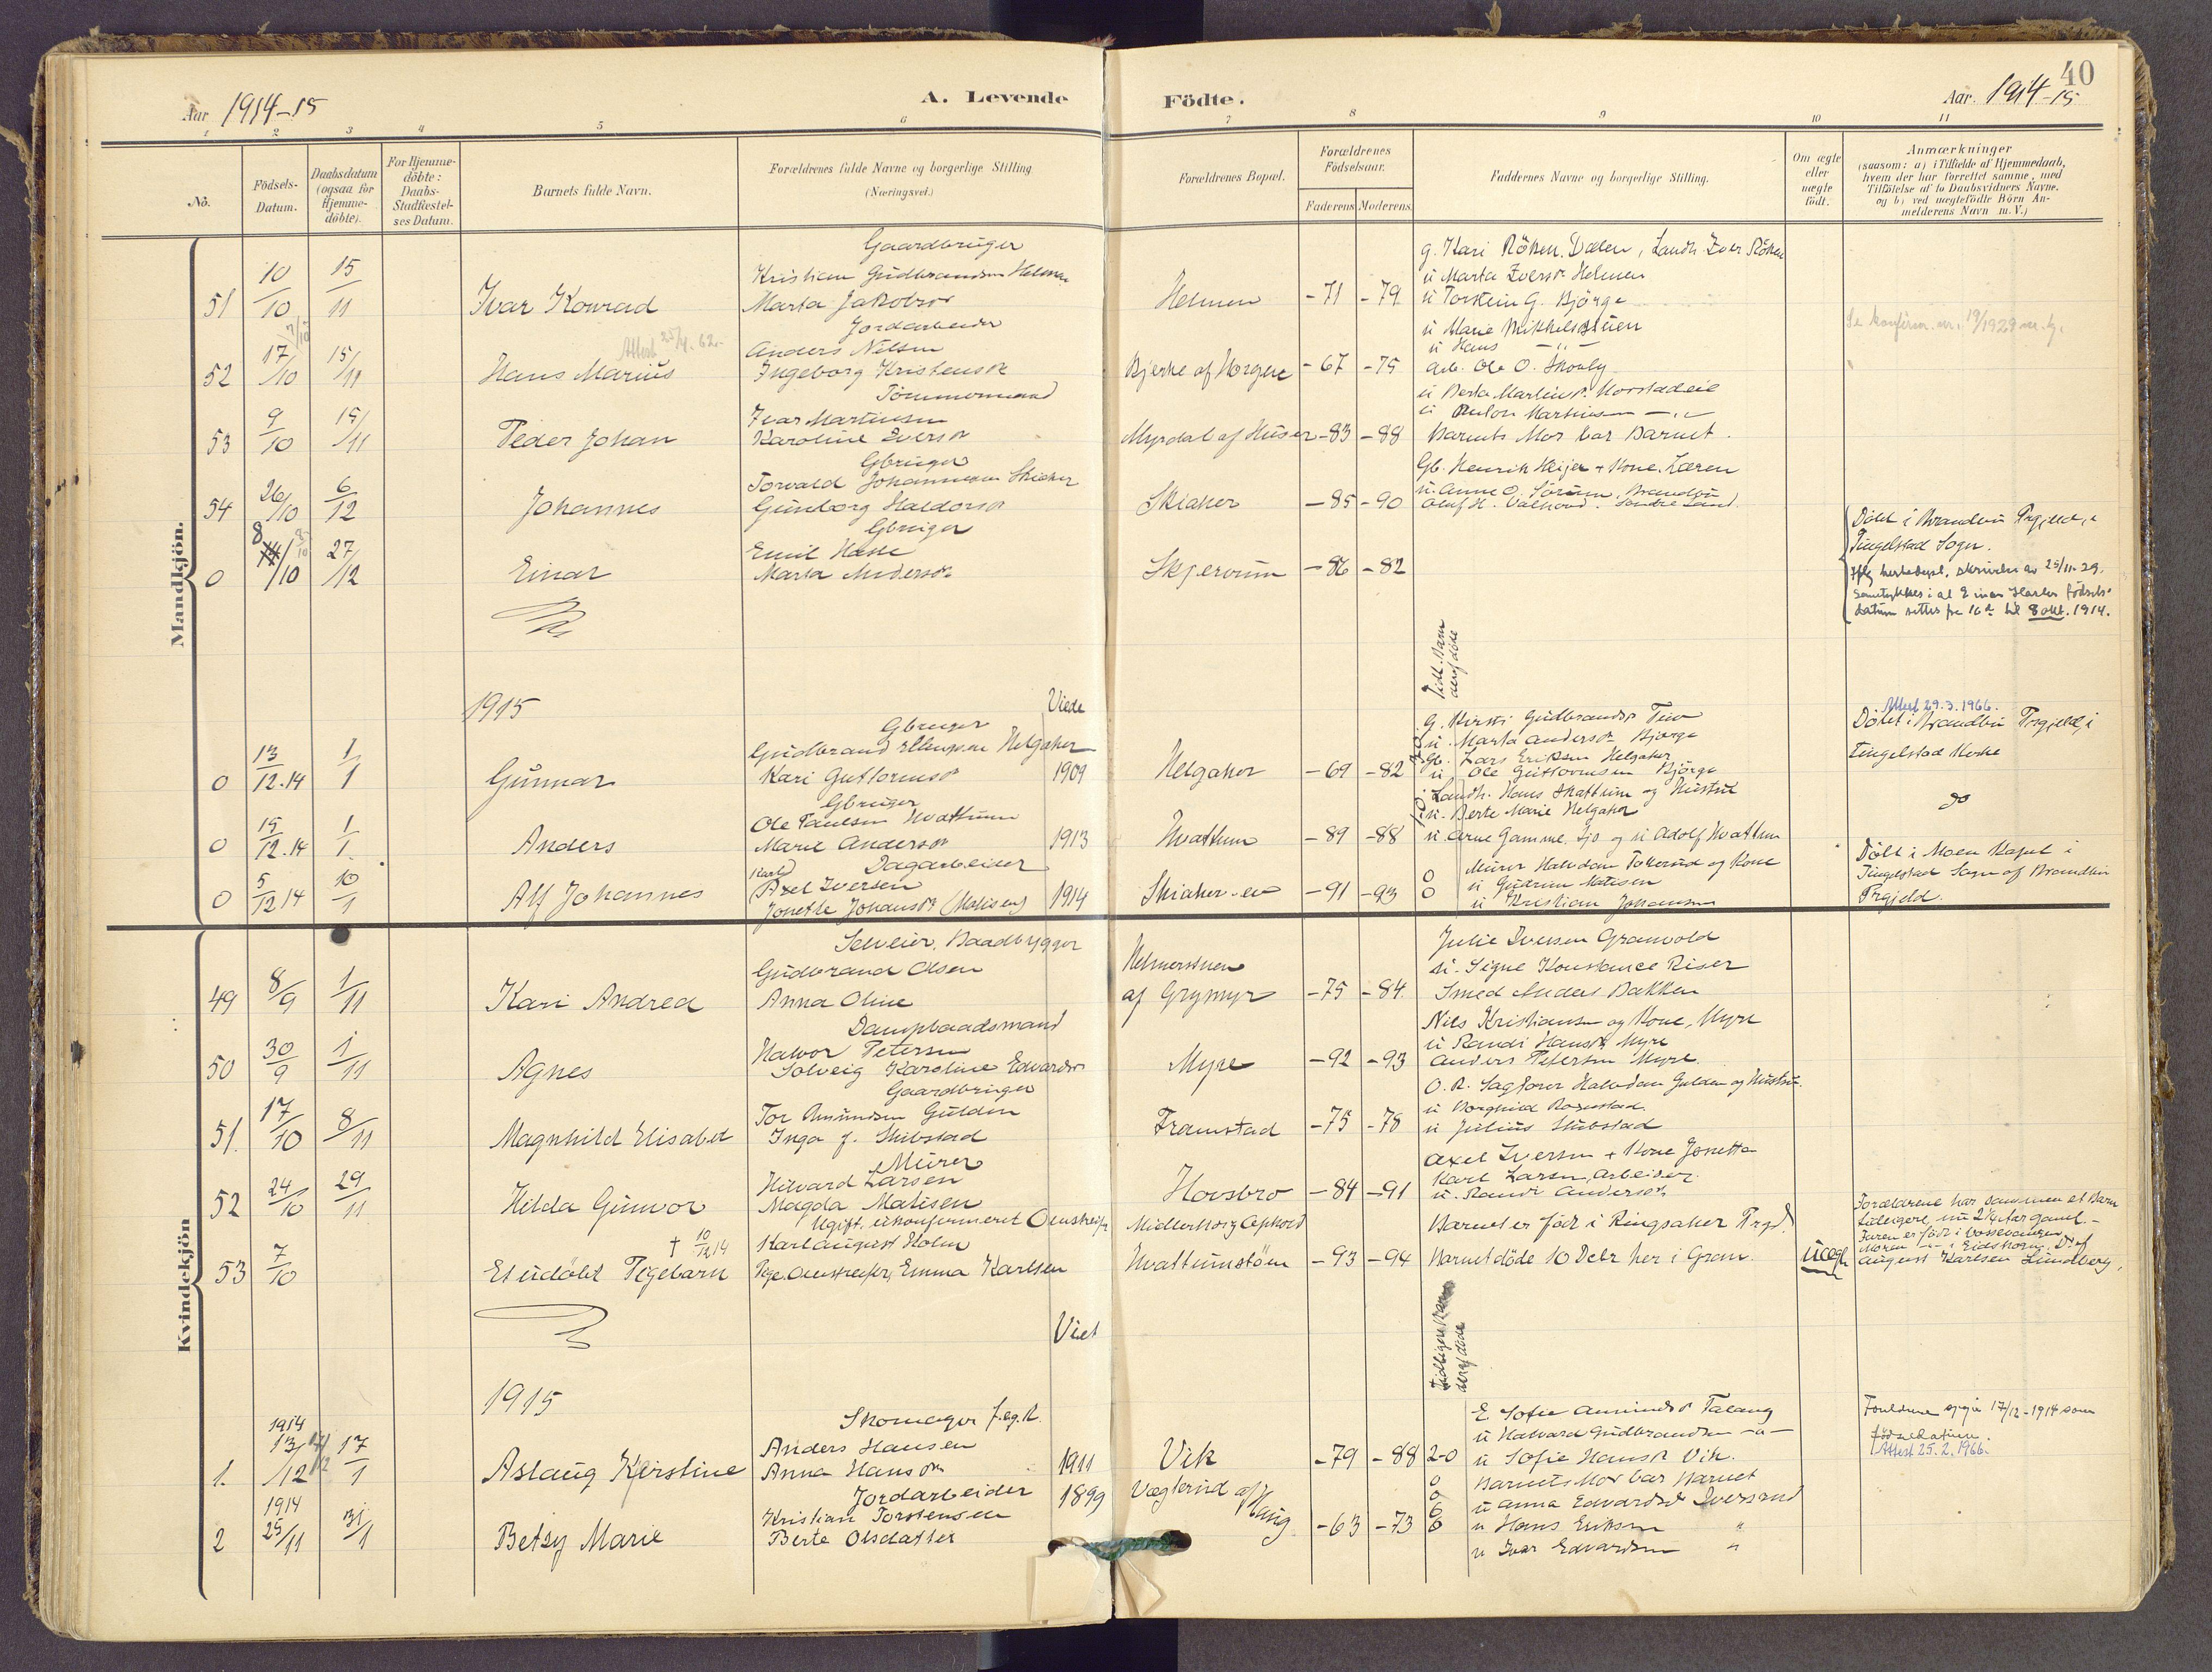 SAH, Gran prestekontor, Parish register (official) no. 21, 1908-1932, p. 40